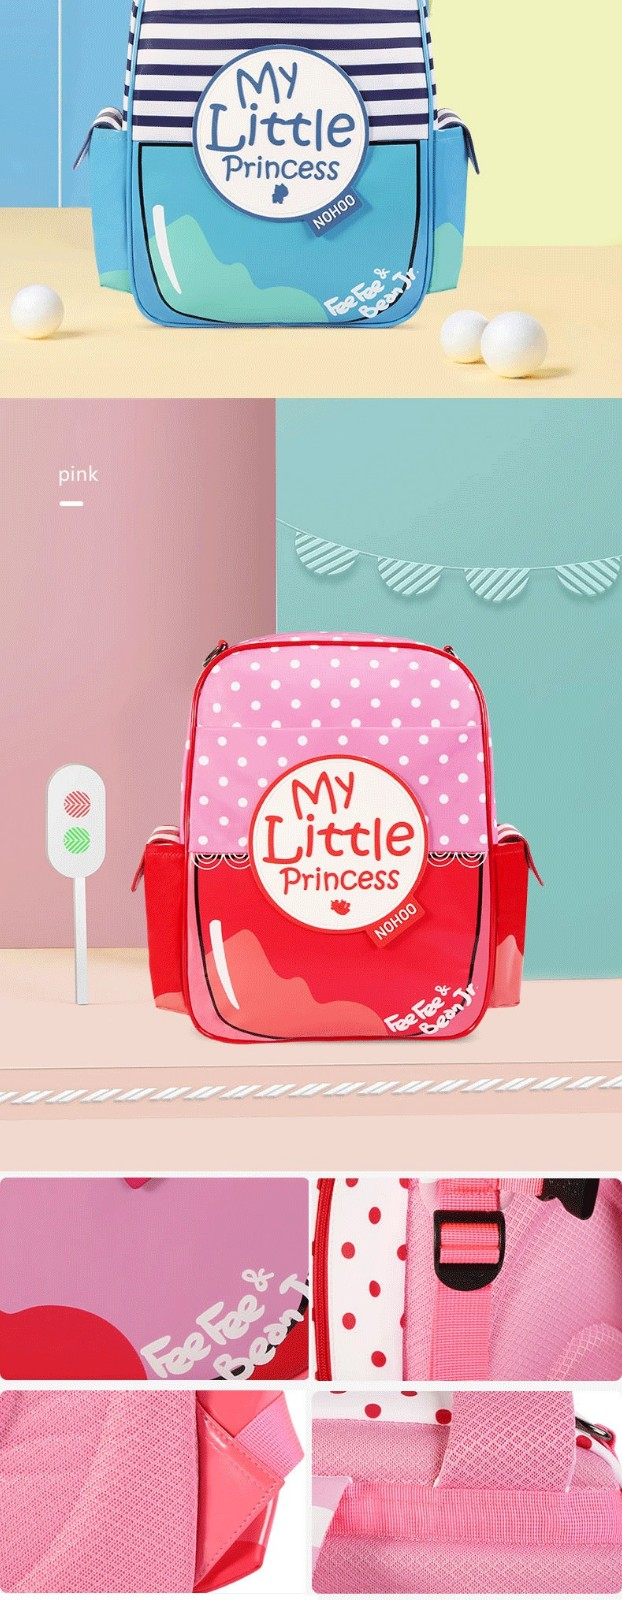 product-Nohoo 2019 new arrival waterproof lightweight PU 3D cartoon children school bag for girls-NO-1